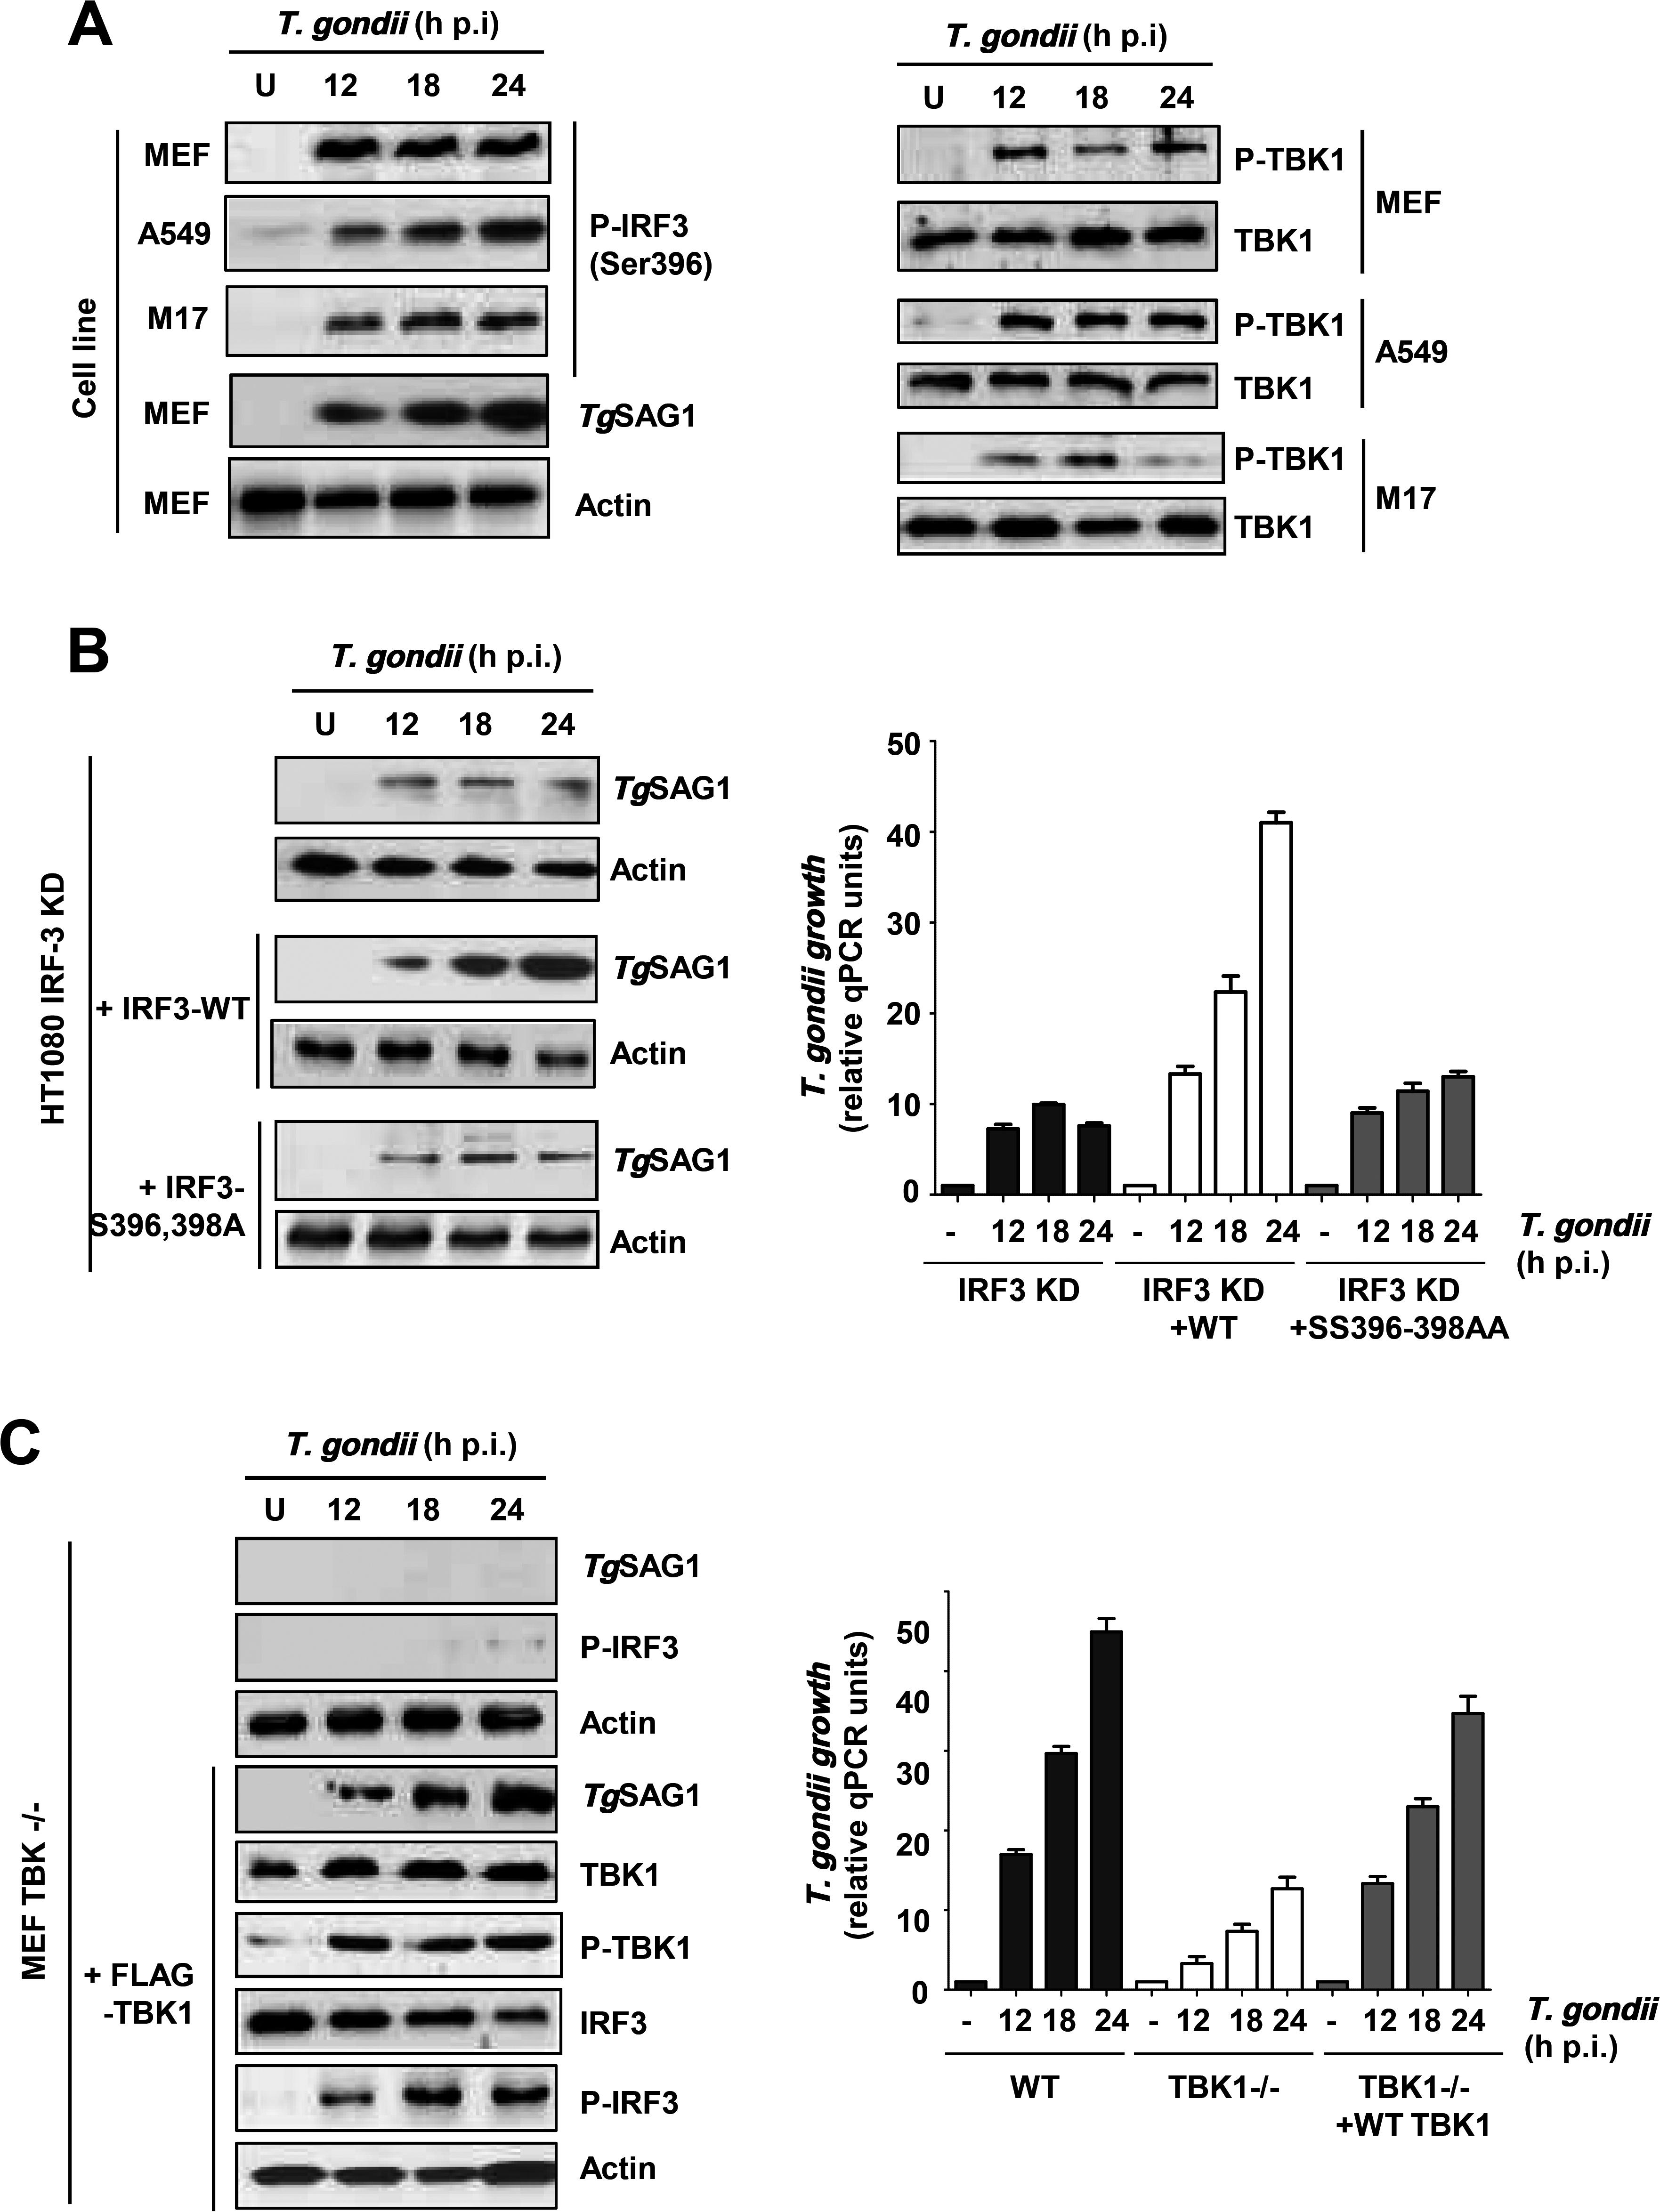 IRF3 phosphorylation is essential for PISA and <i>T</i>. <i>gondii</i> replication.